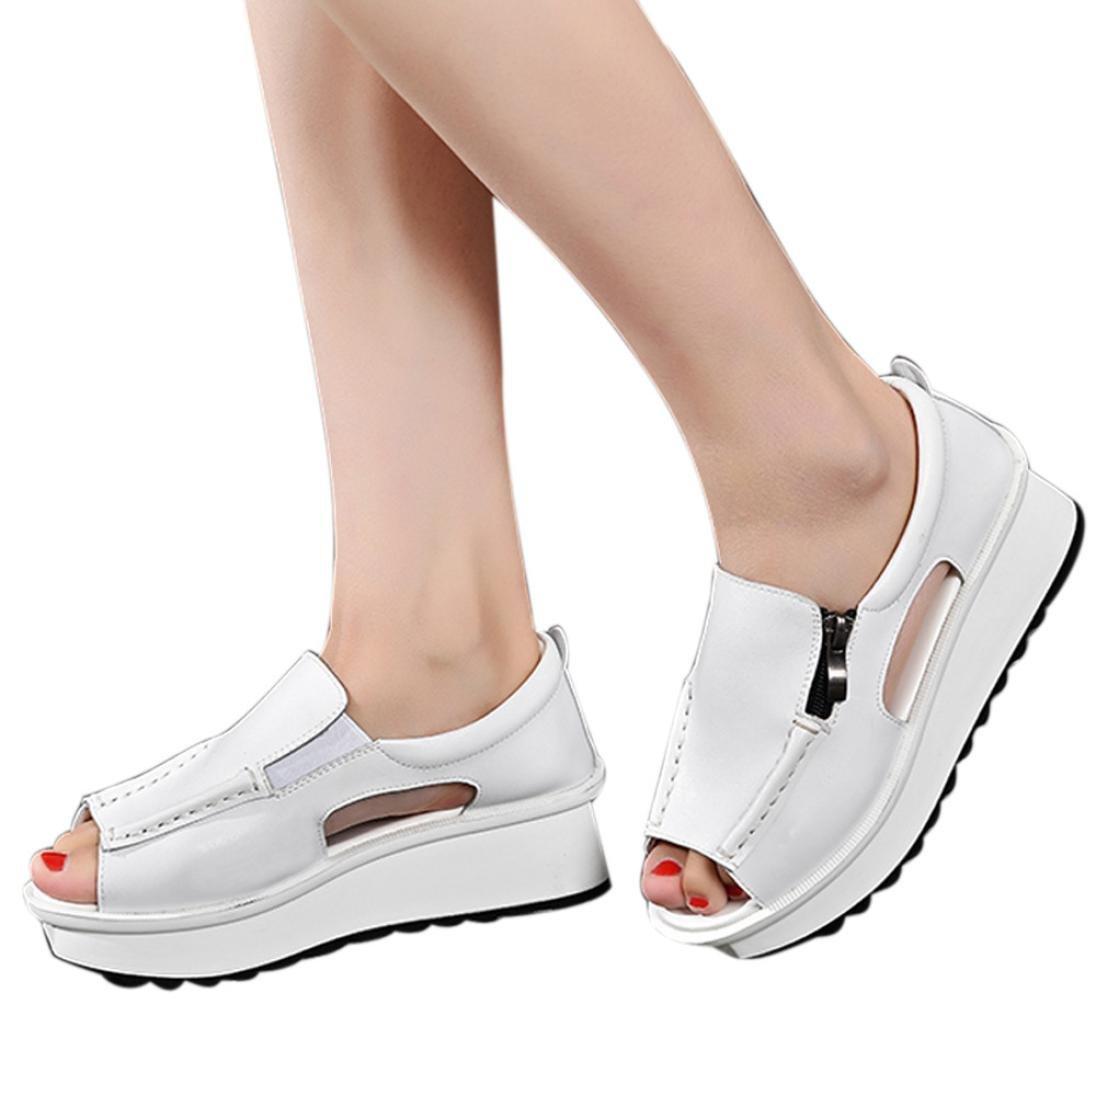 Zipper Platform Sandals,Clearance! AgrinTol Summer Women Sandals Wedges Open Toe Round Toe Shoes